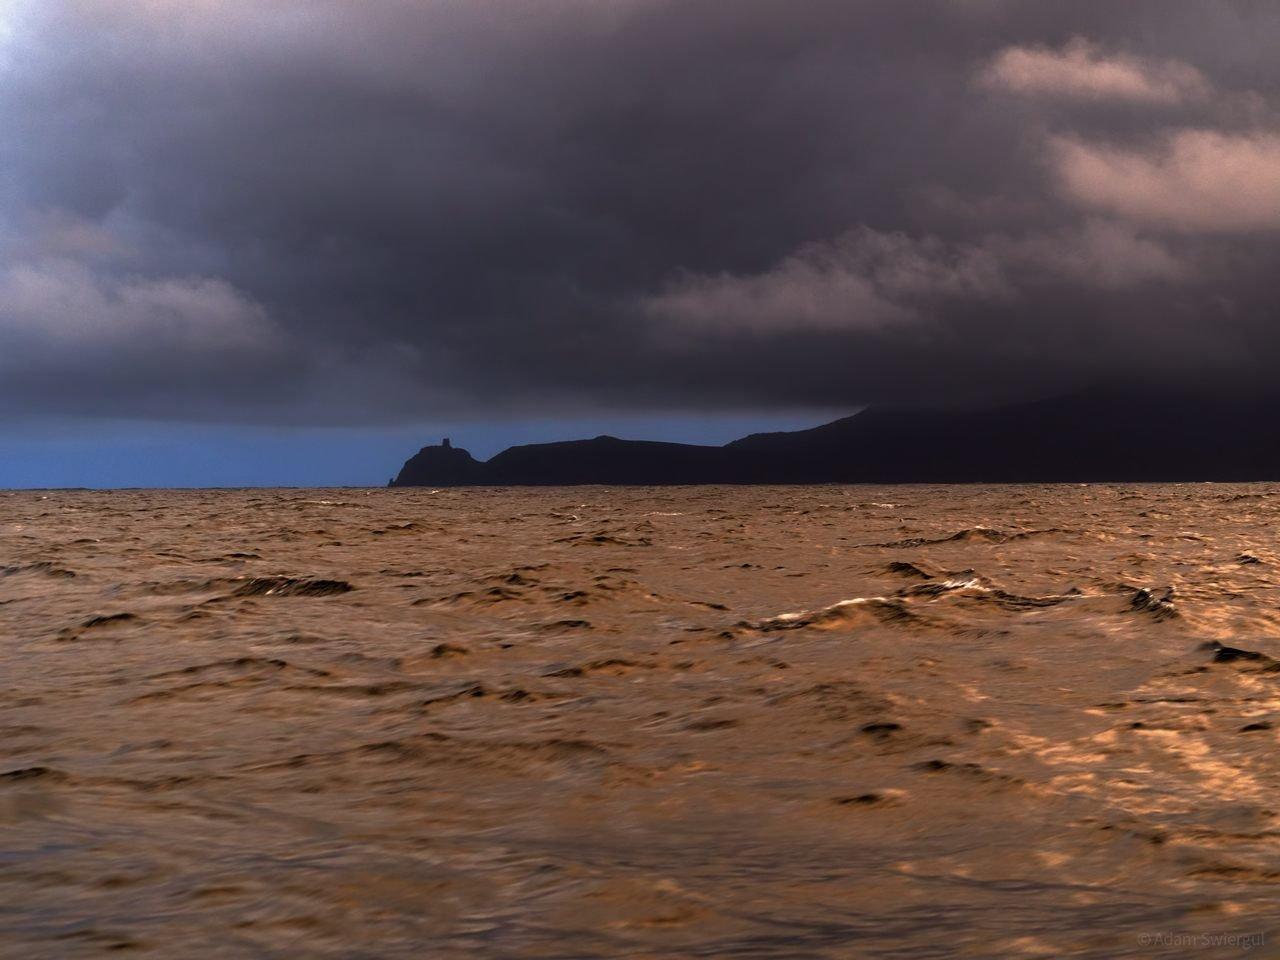 Na morzu burzowo